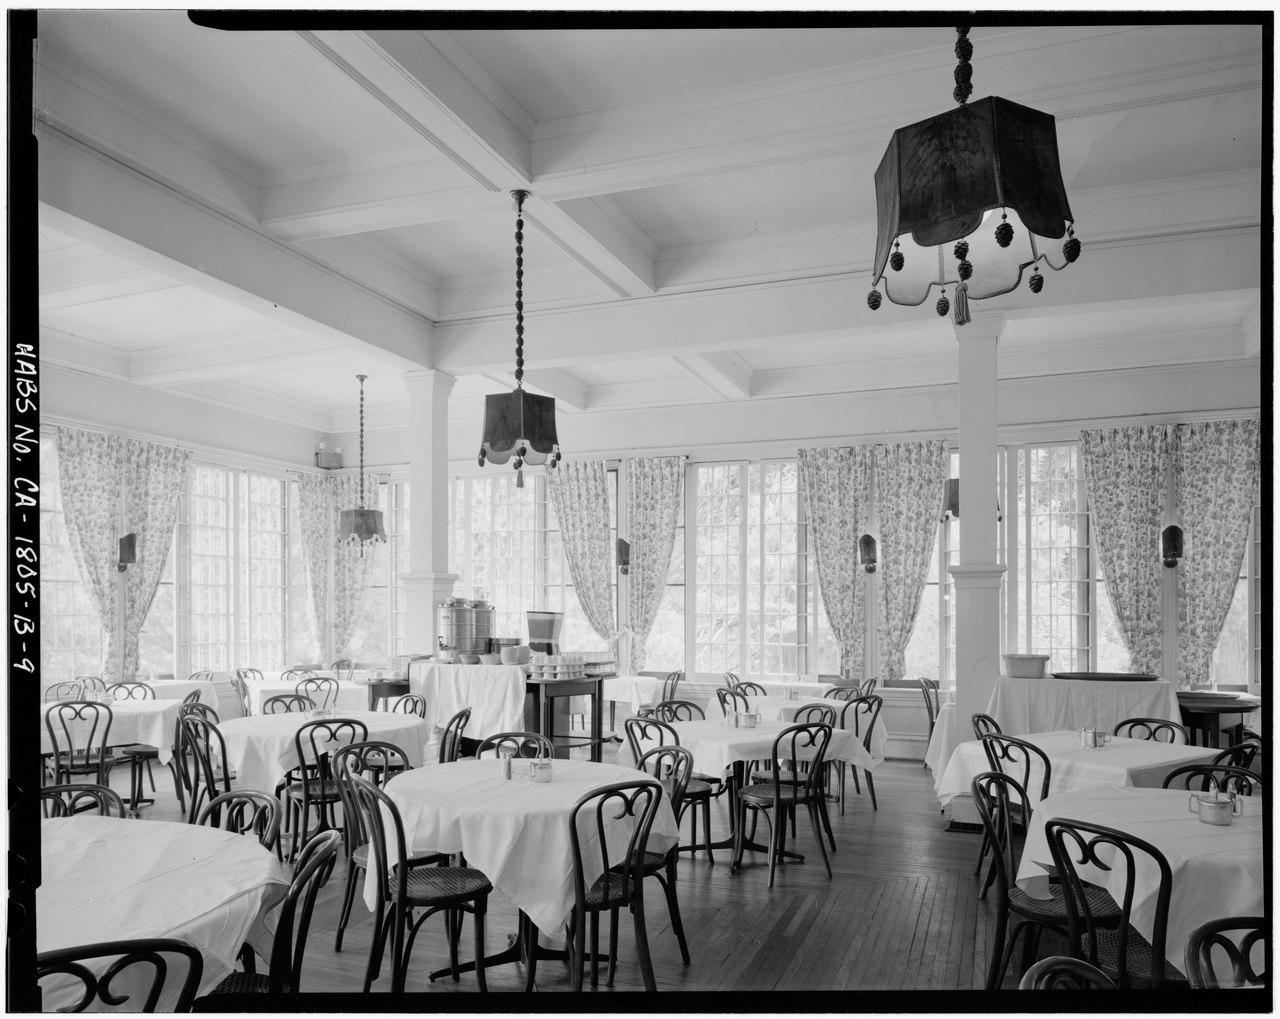 Congress Hotel Room